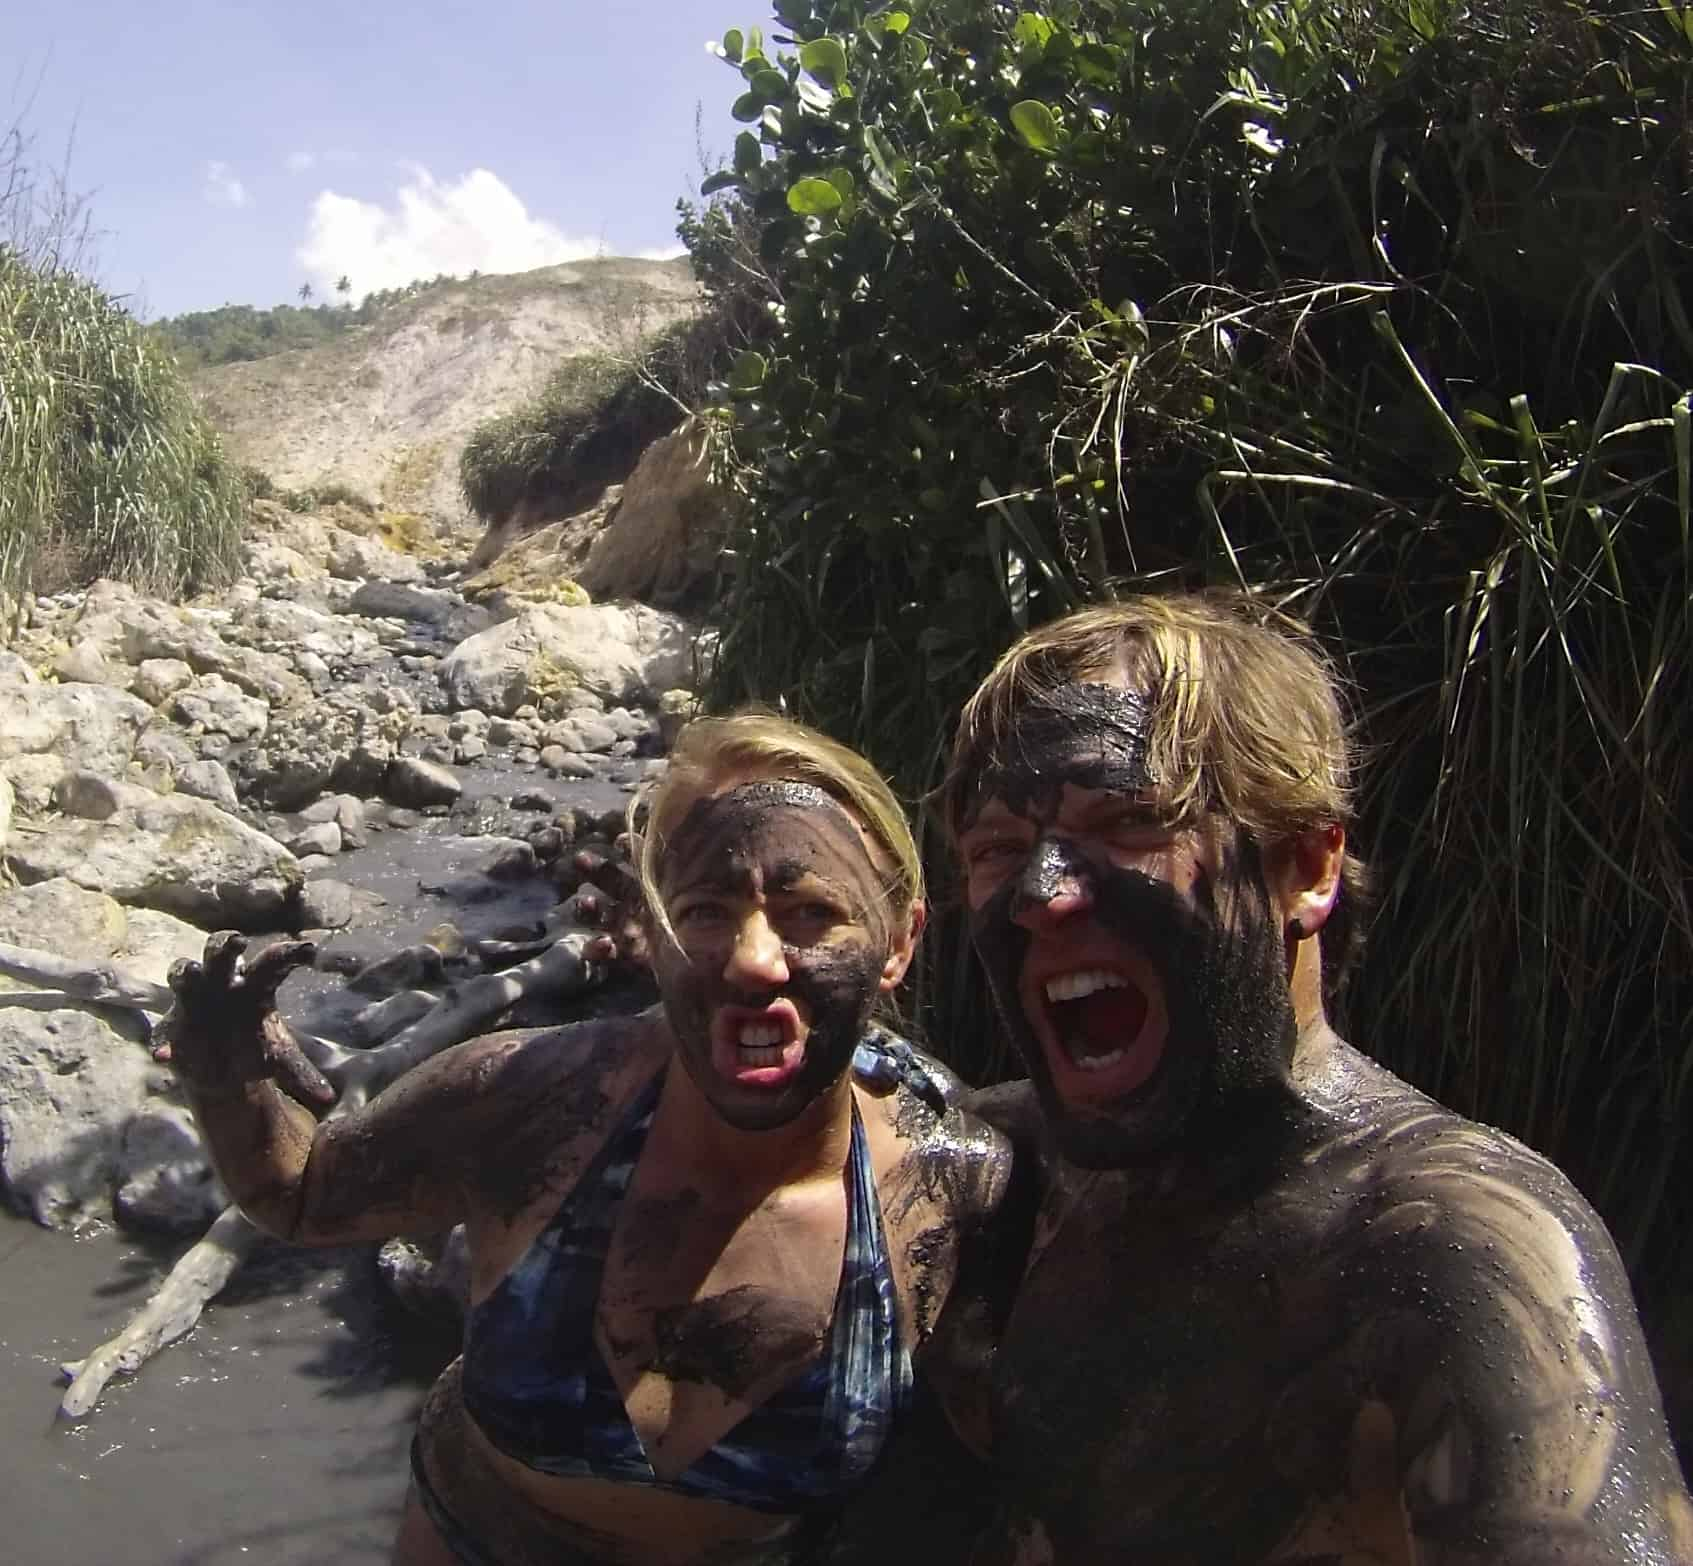 St Lucia Sulphur Springs Mud Smear Fest